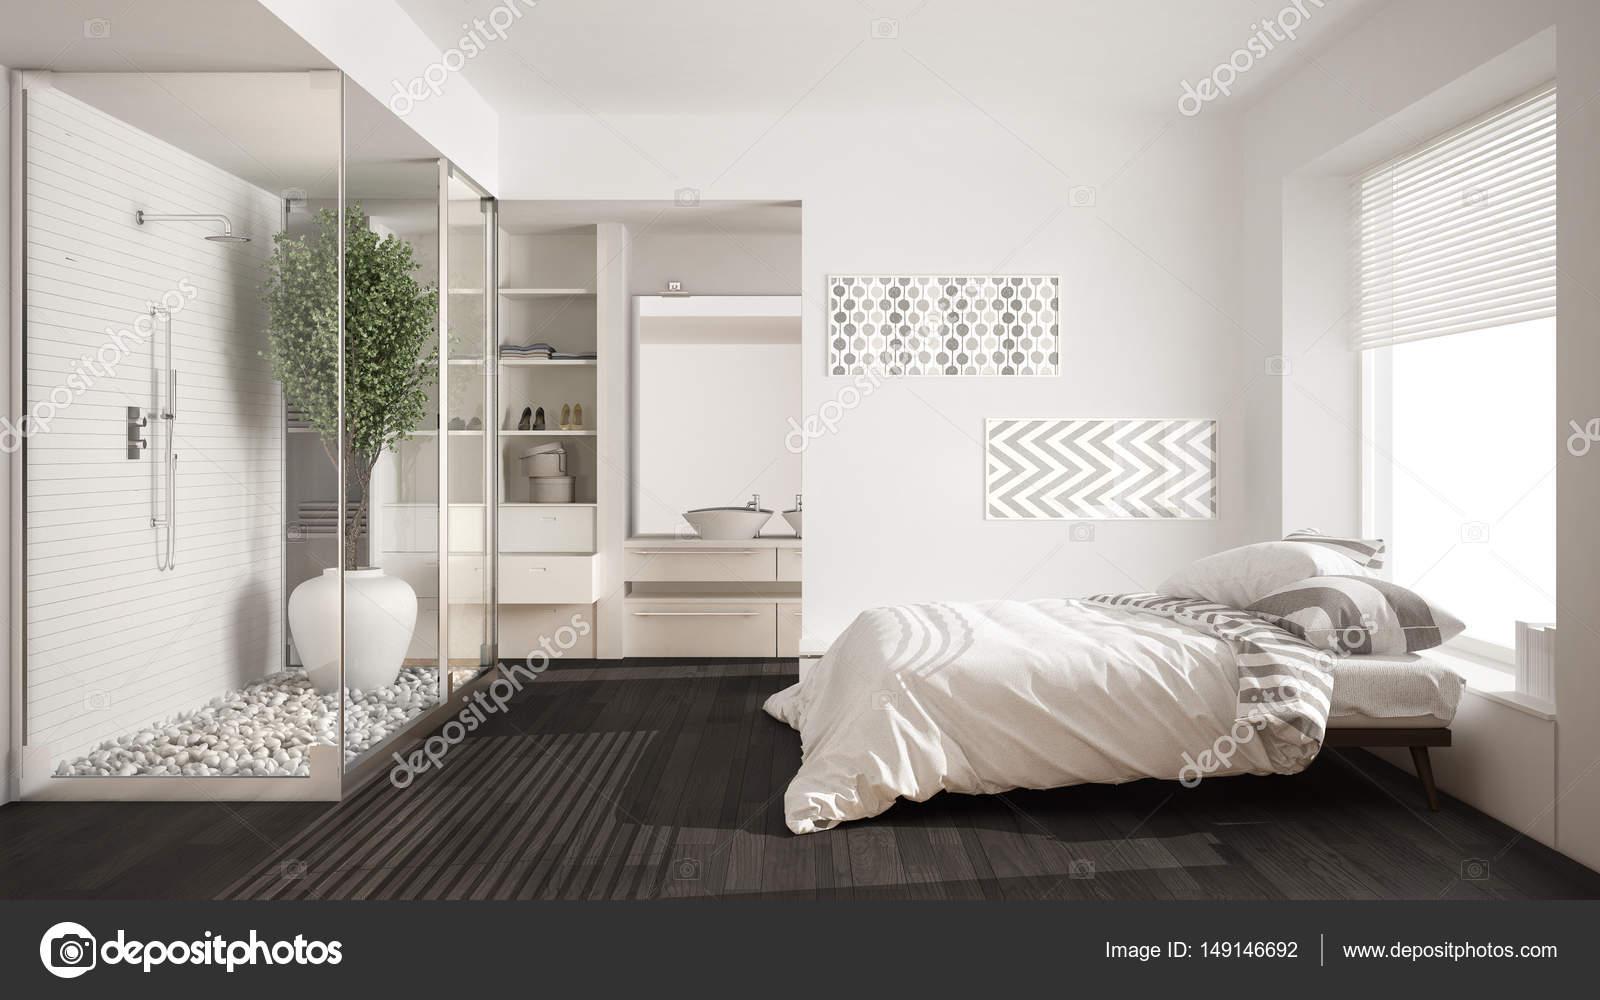 https://st3.depositphotos.com/1152281/14914/i/1600/depositphotos_149146692-stock-photo-minimalist-bedroom-and-bathroom-with.jpg